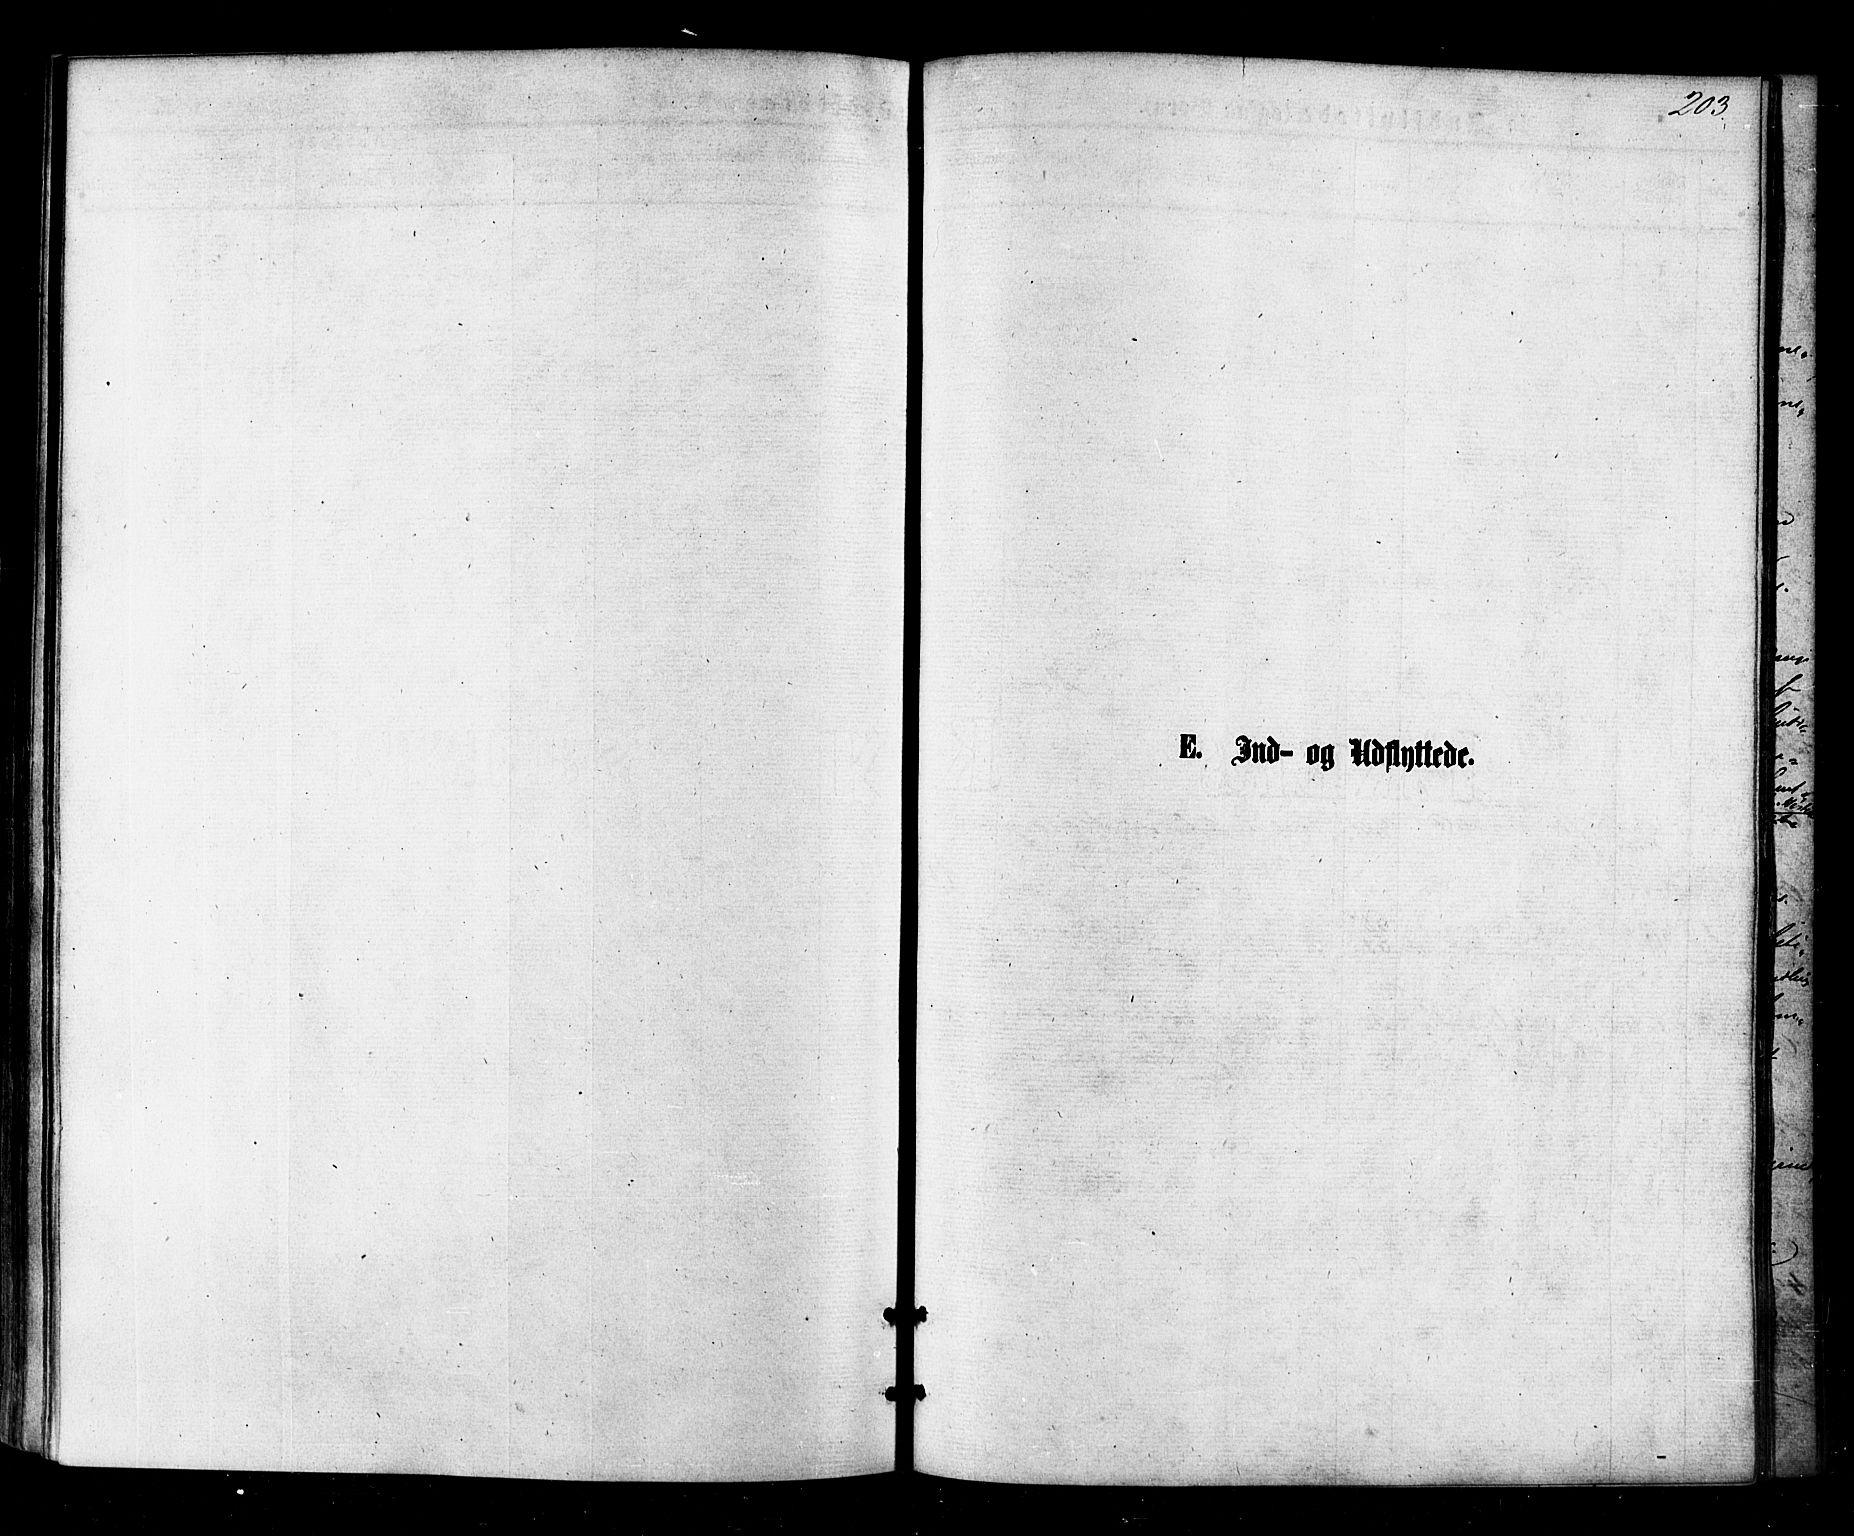 SATØ, Kistrand/Porsanger sokneprestembete, Ministerialbok nr. 6, 1875-1880, s. 203